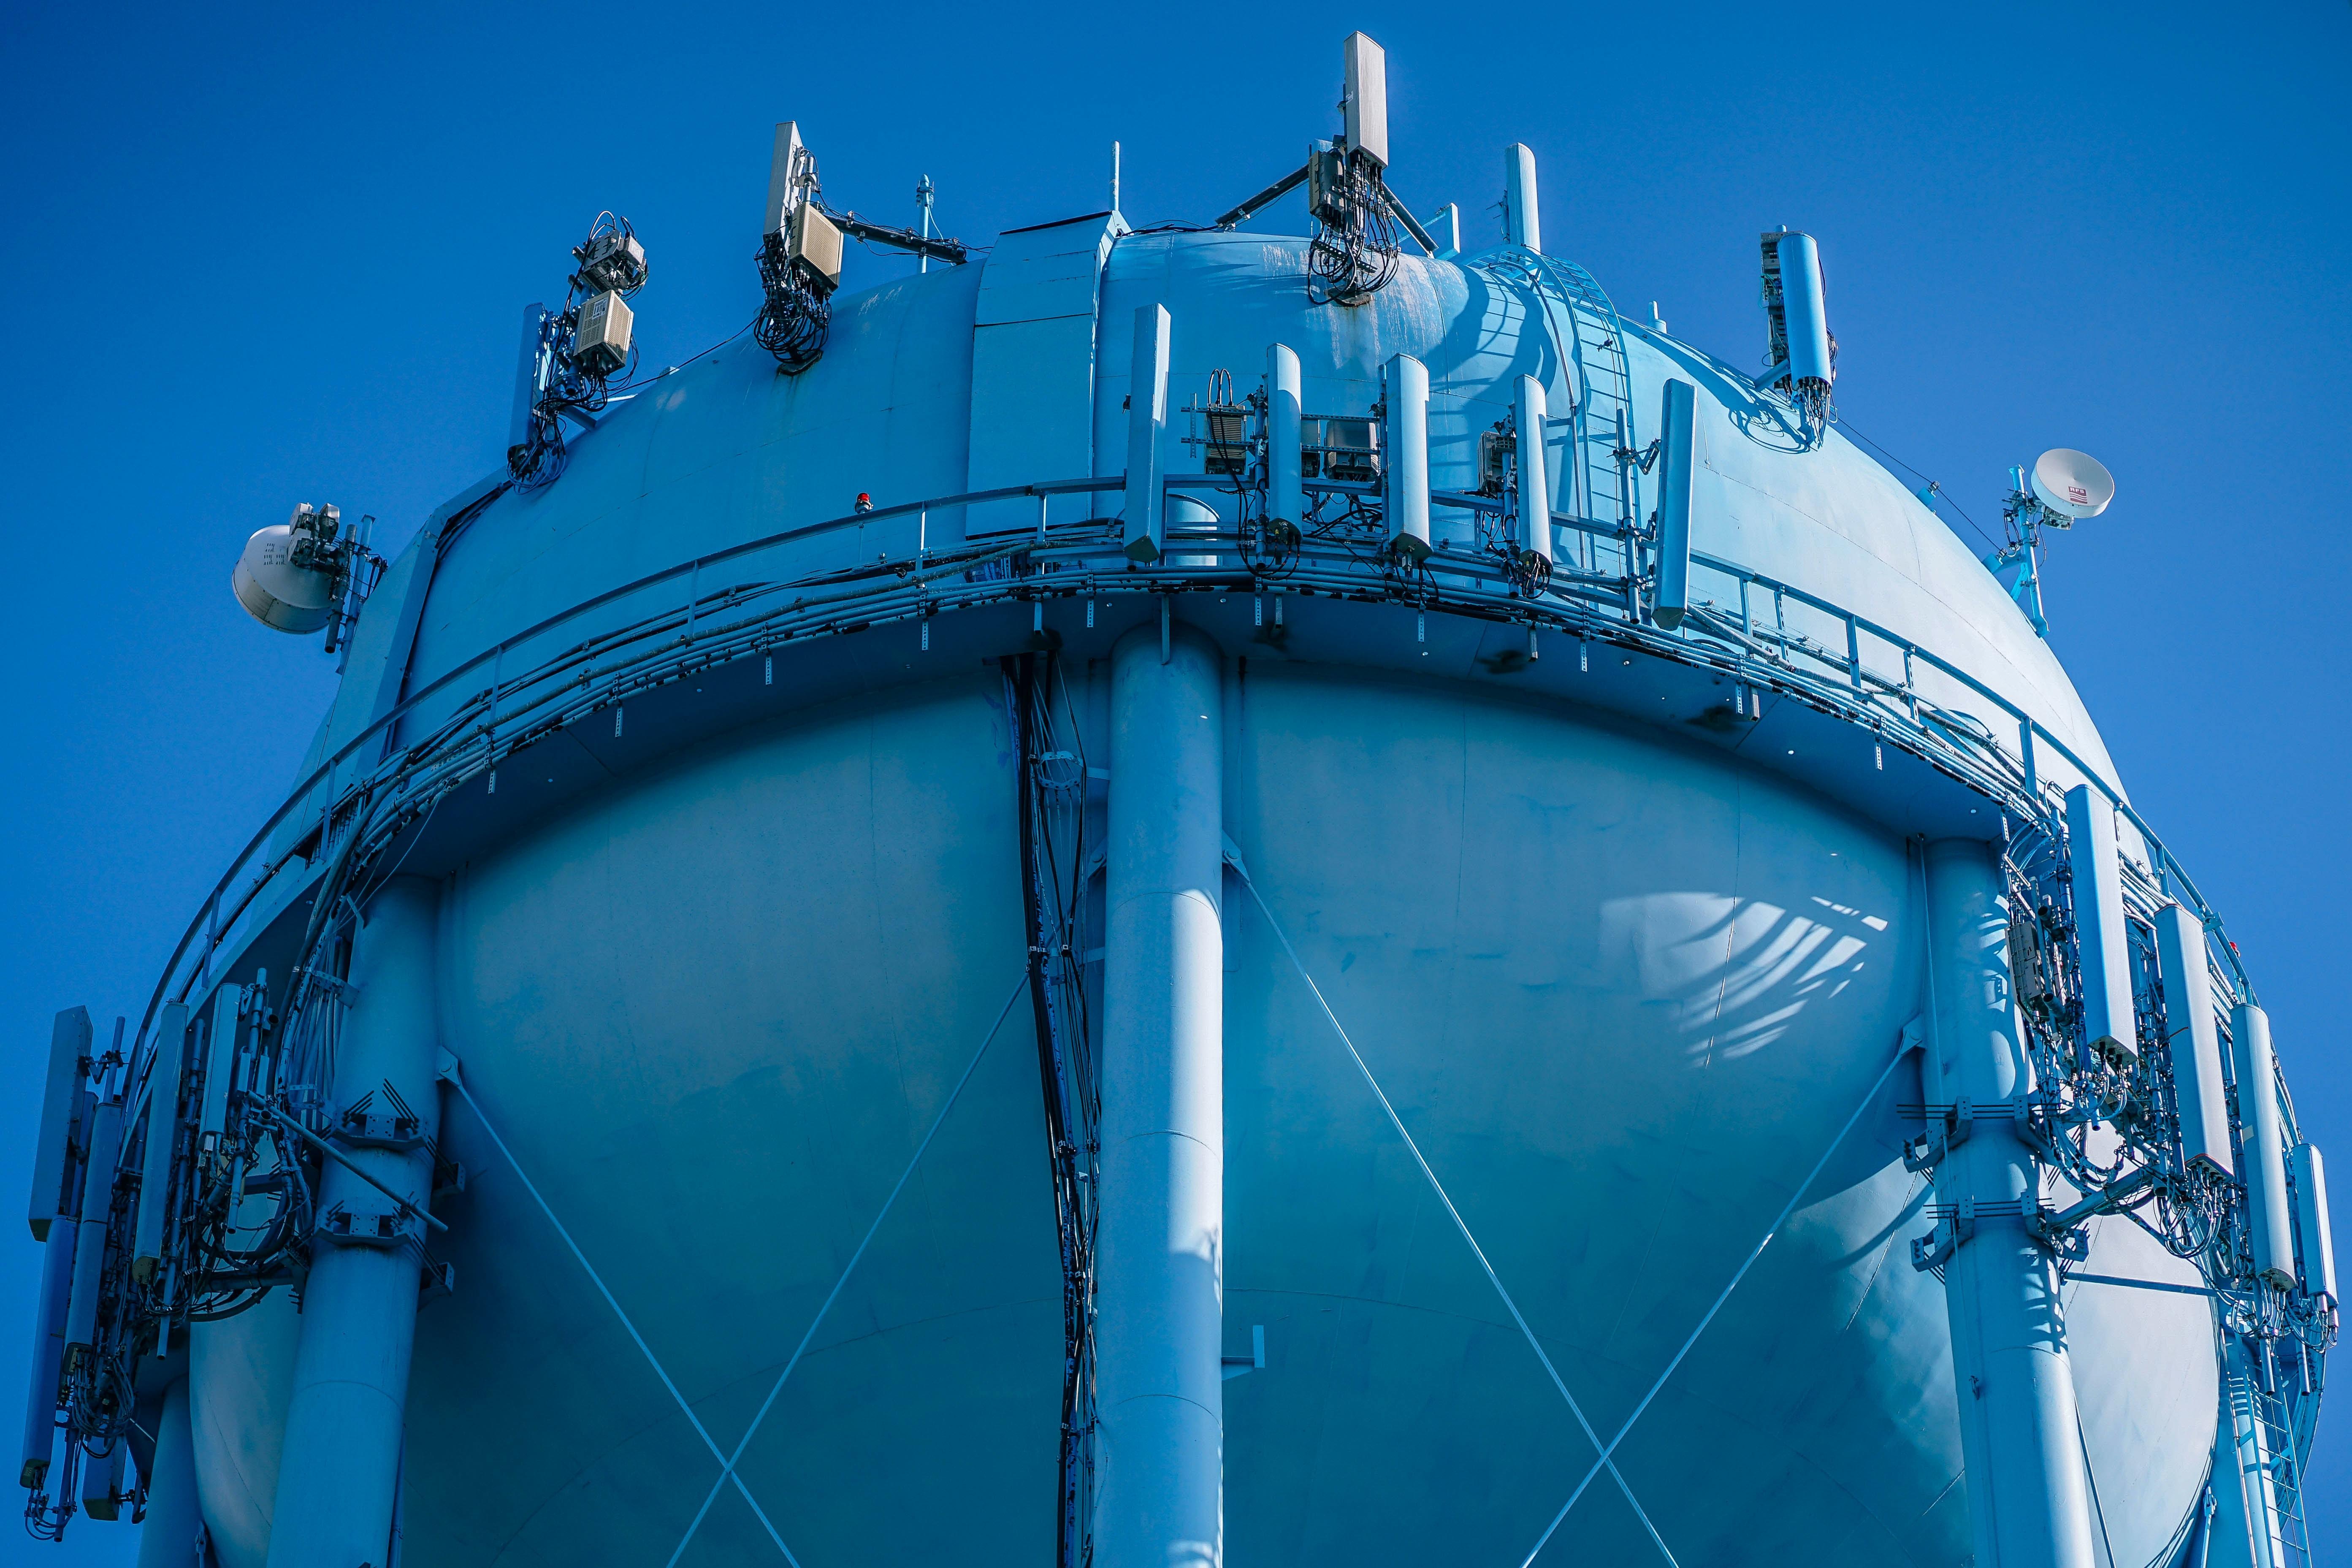 low angle photo of blue metal tank